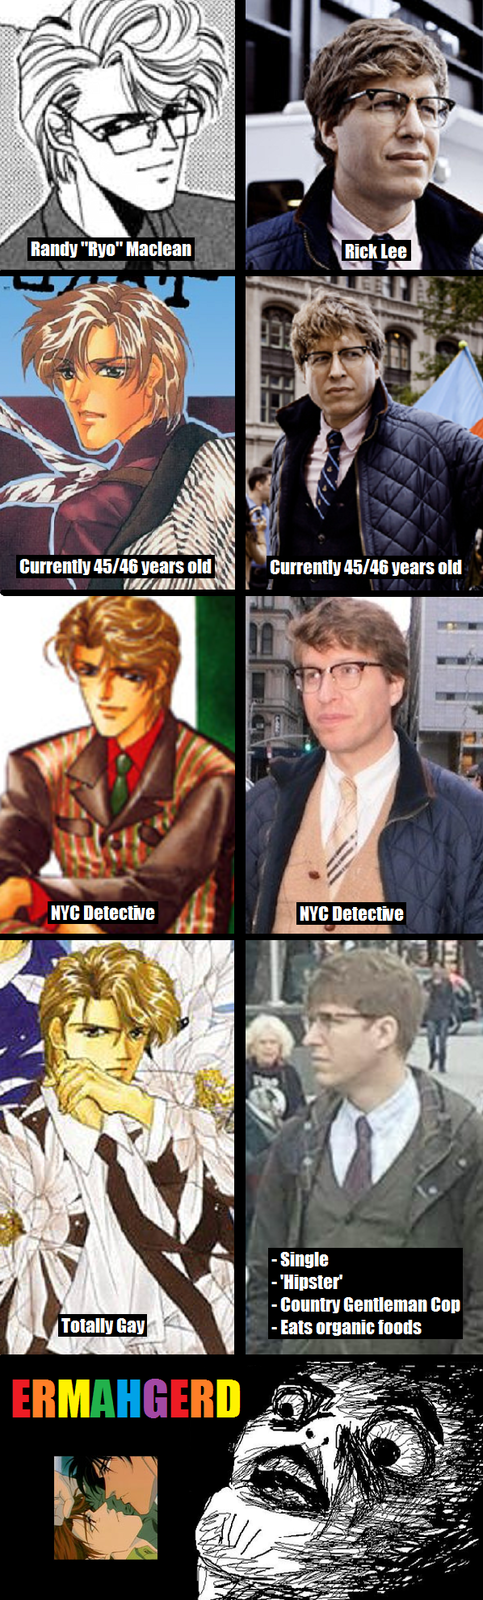 Hipster Cop's Secret Identity